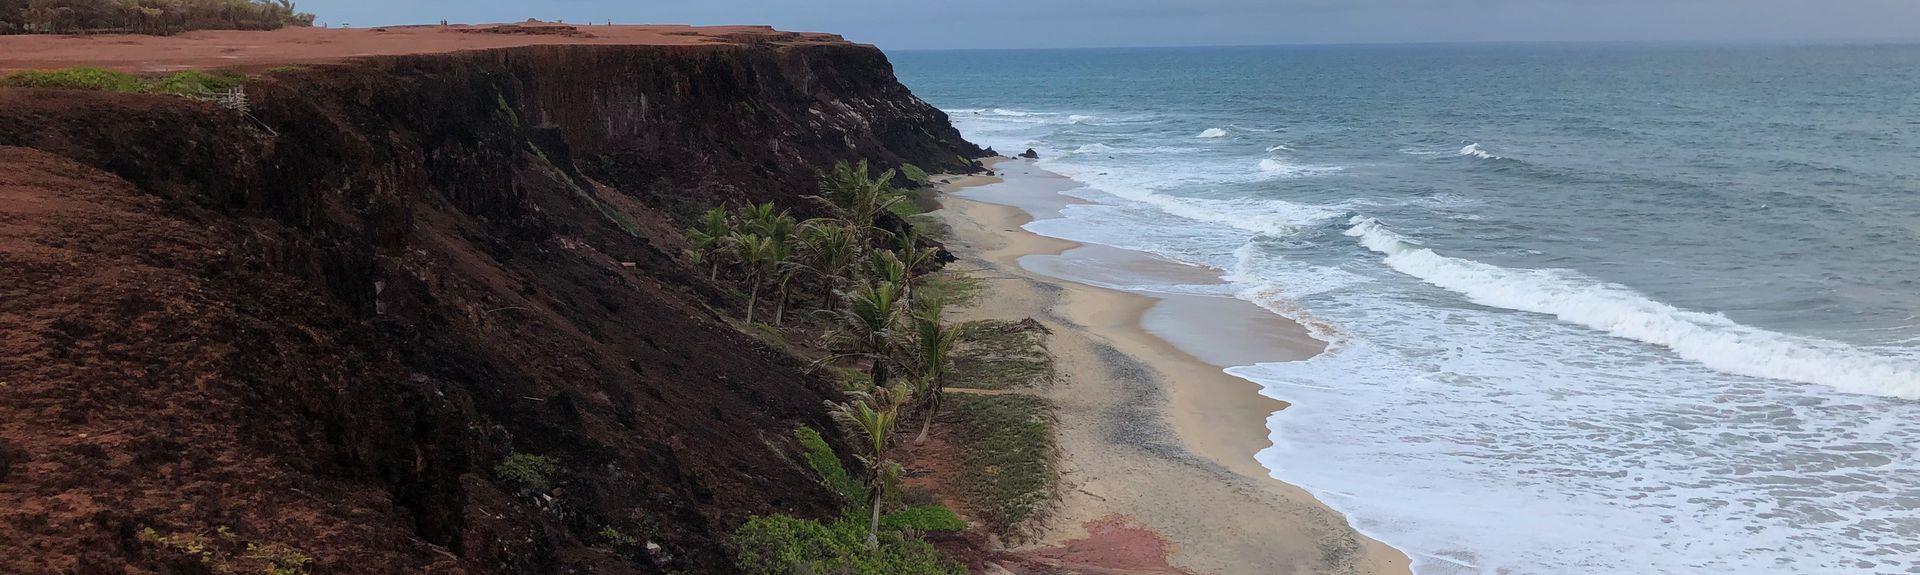 Baia Formosa, Northeast Region, Brazil